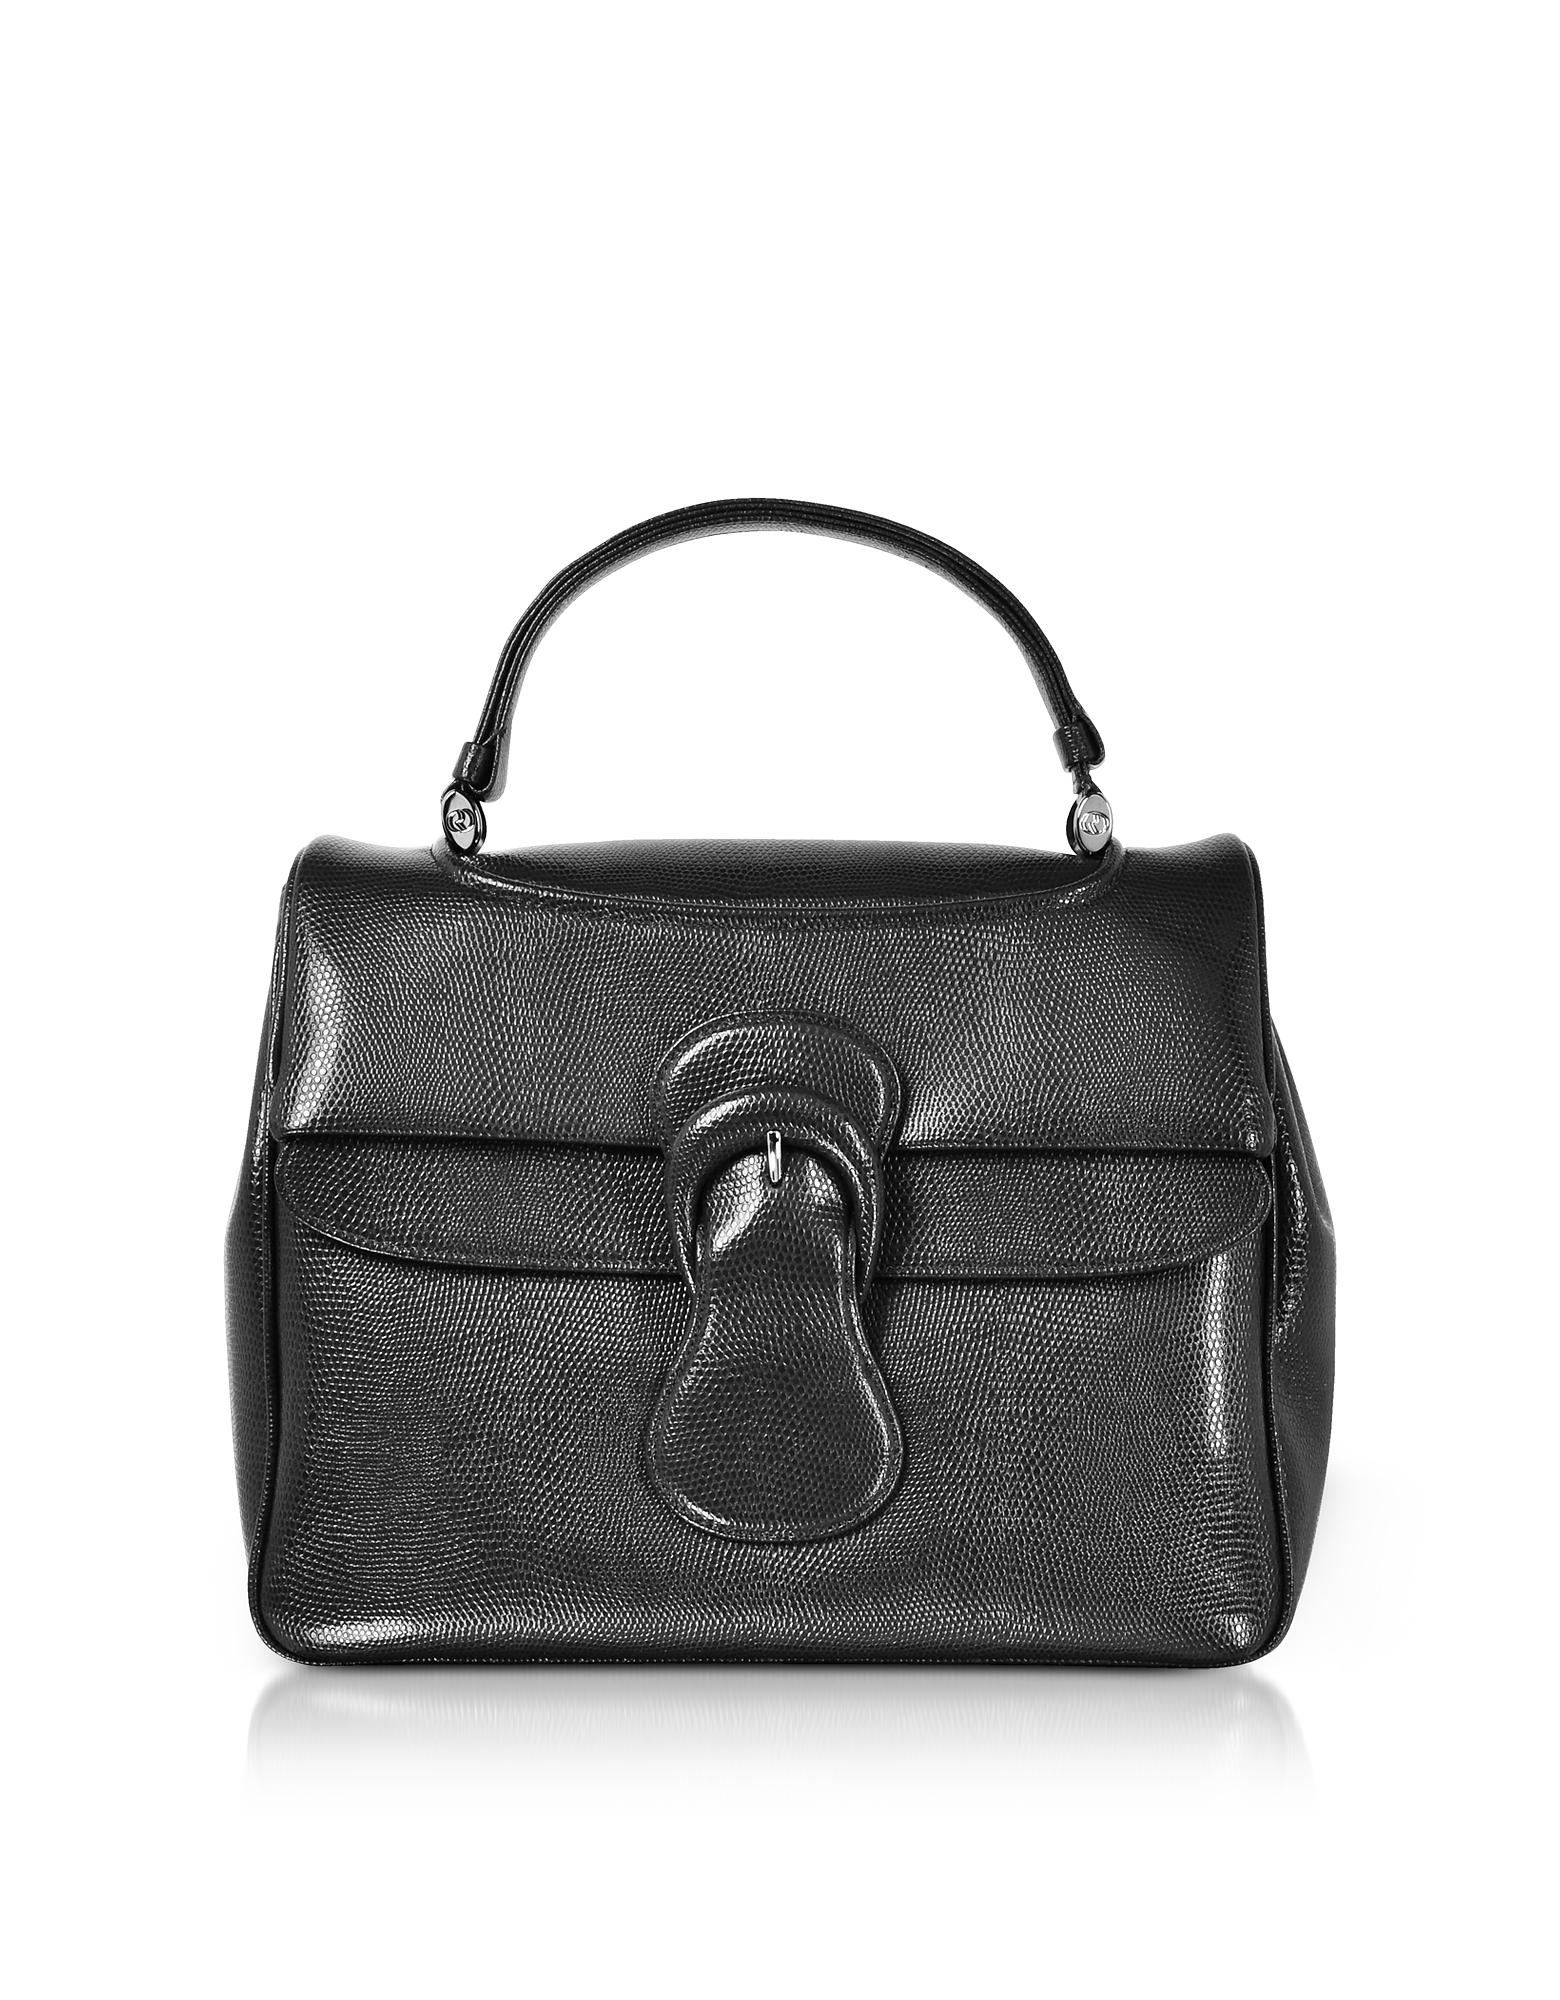 Rodo Handbags, Lizard Embossed Leather Satchel Bag